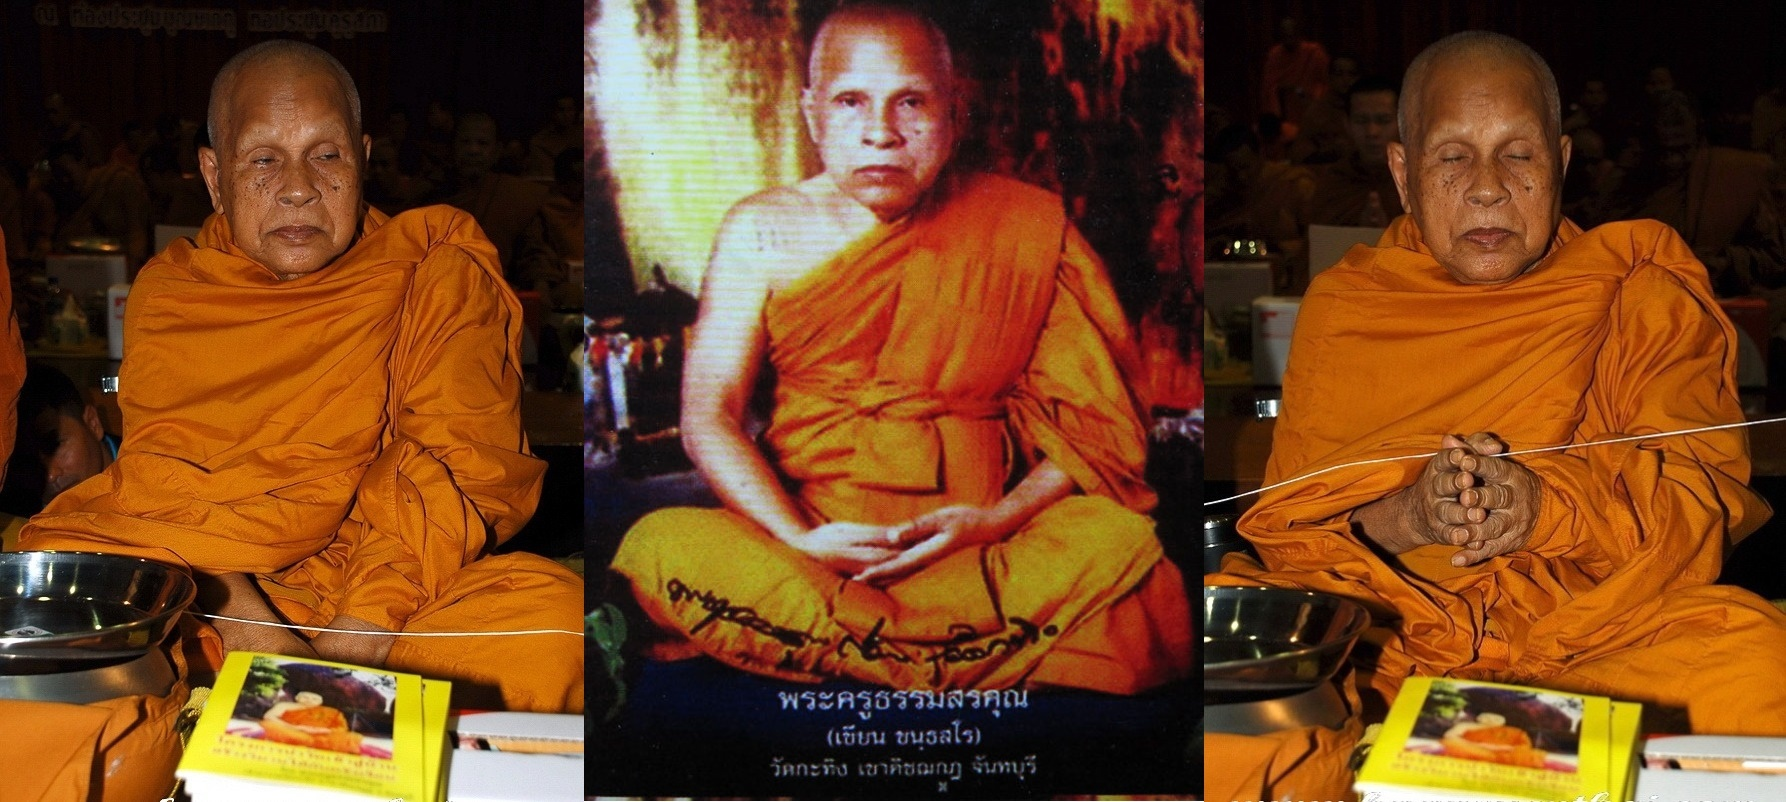 Luang Pho Khian